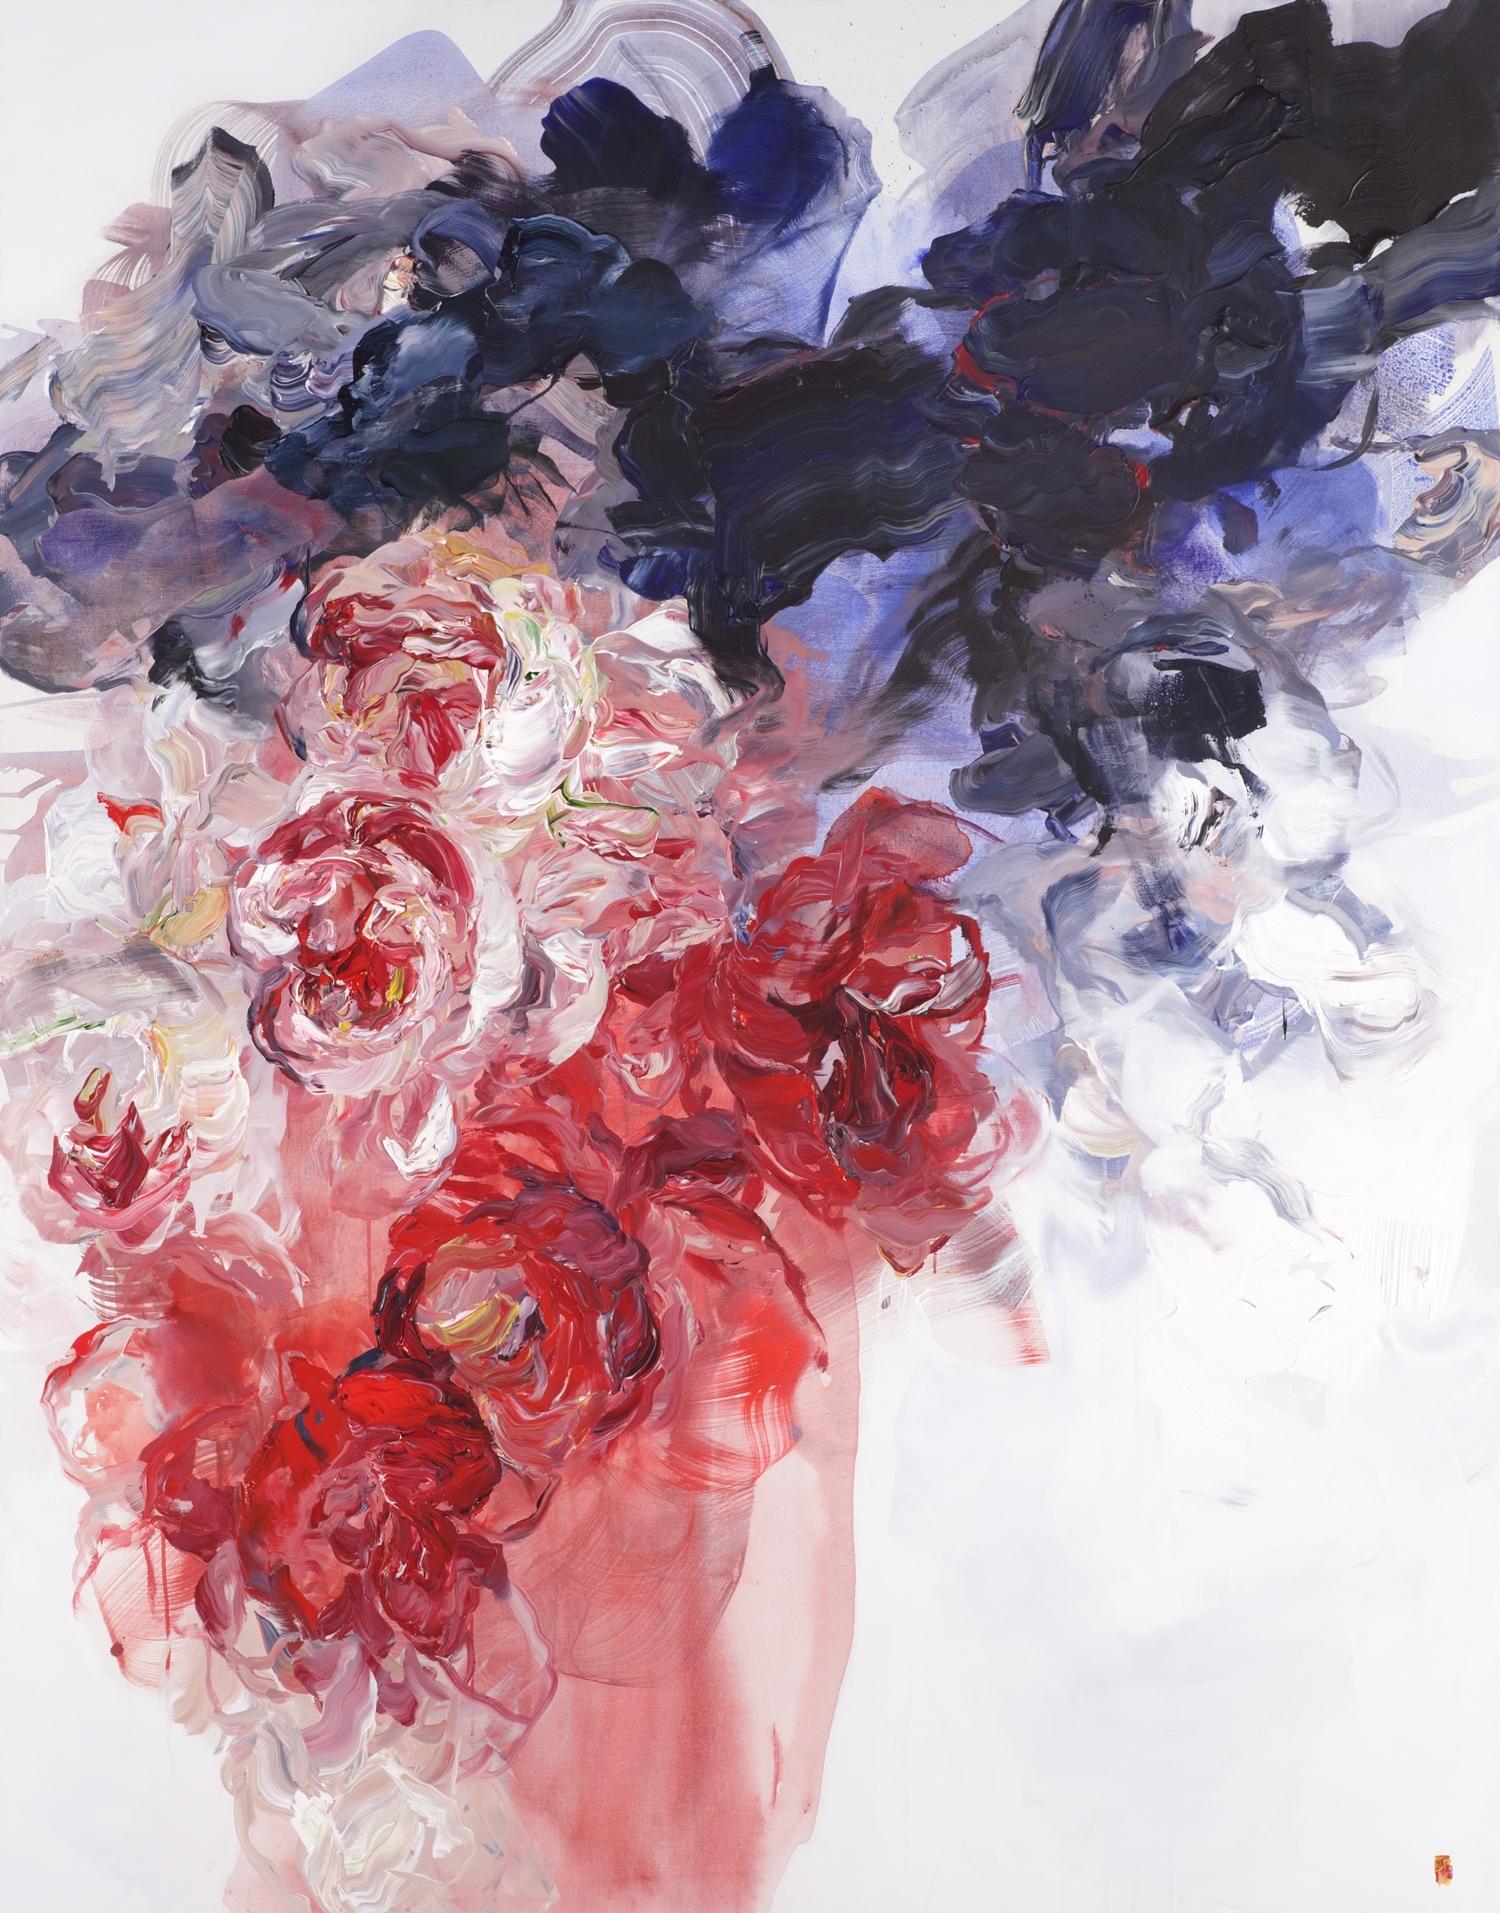 Blindfold #2 84x66 2016